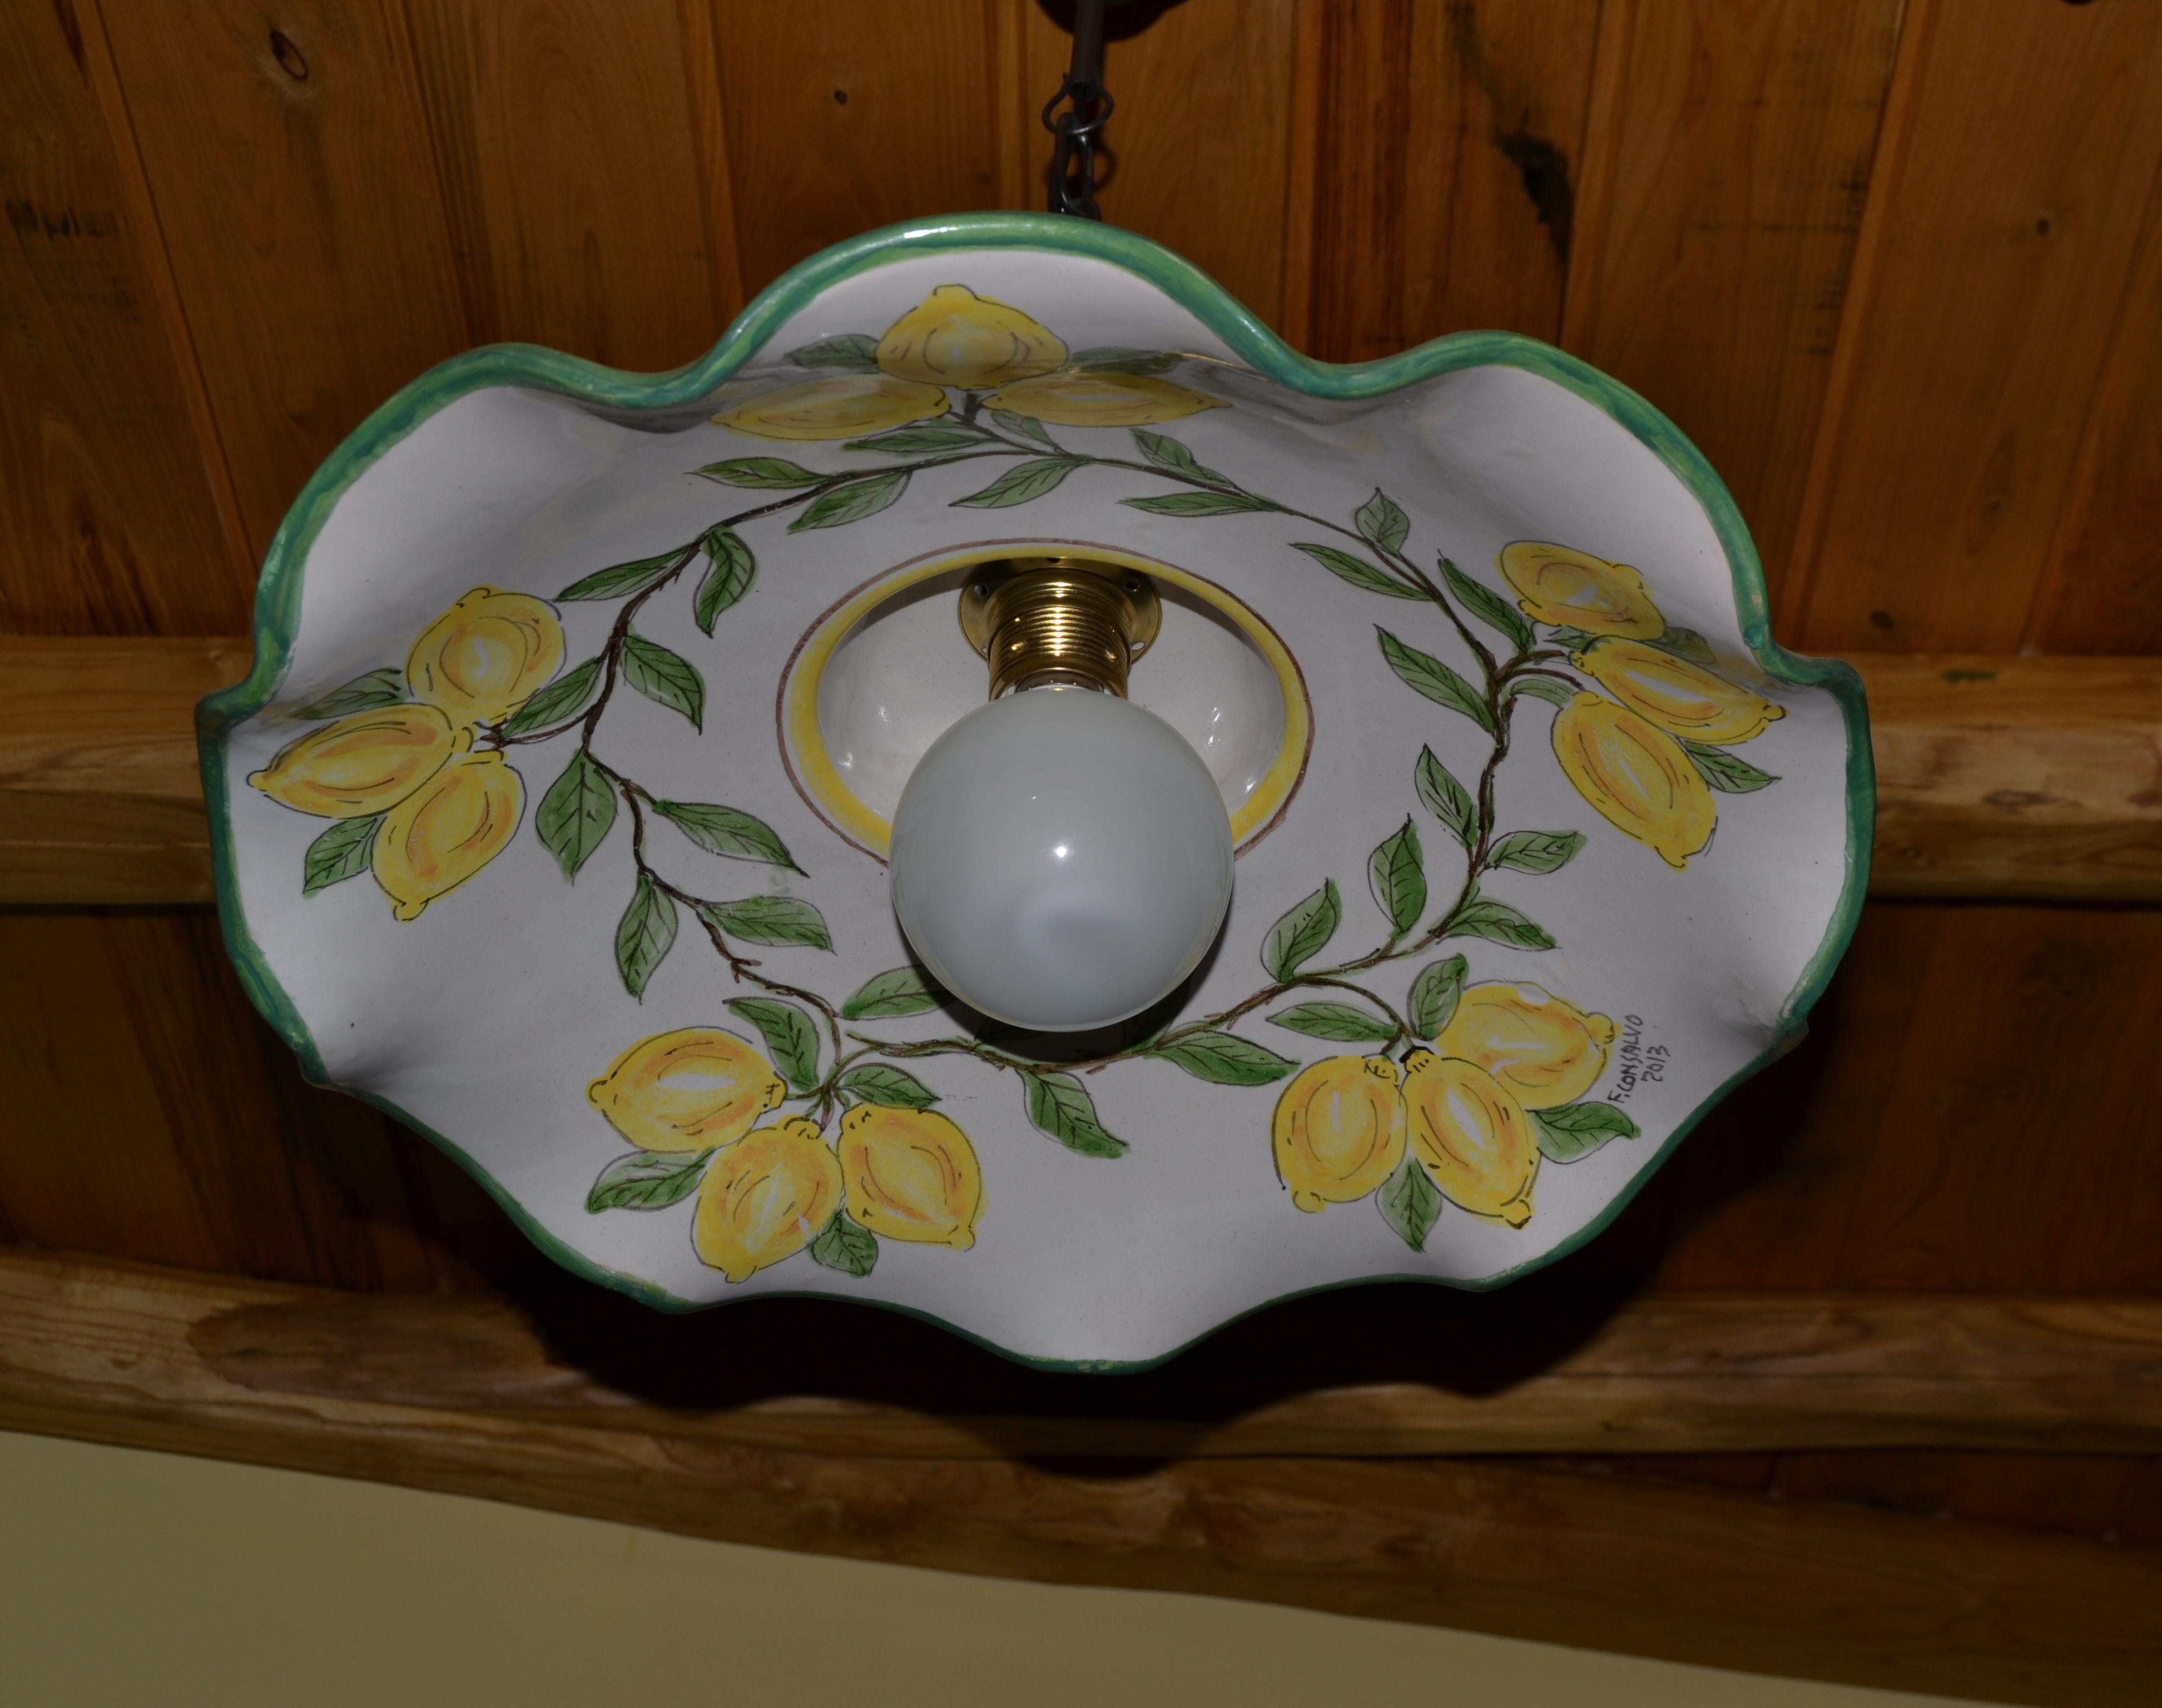 Particolare lampadario in ceramica dipinto a mano - cucina soggiorno ...